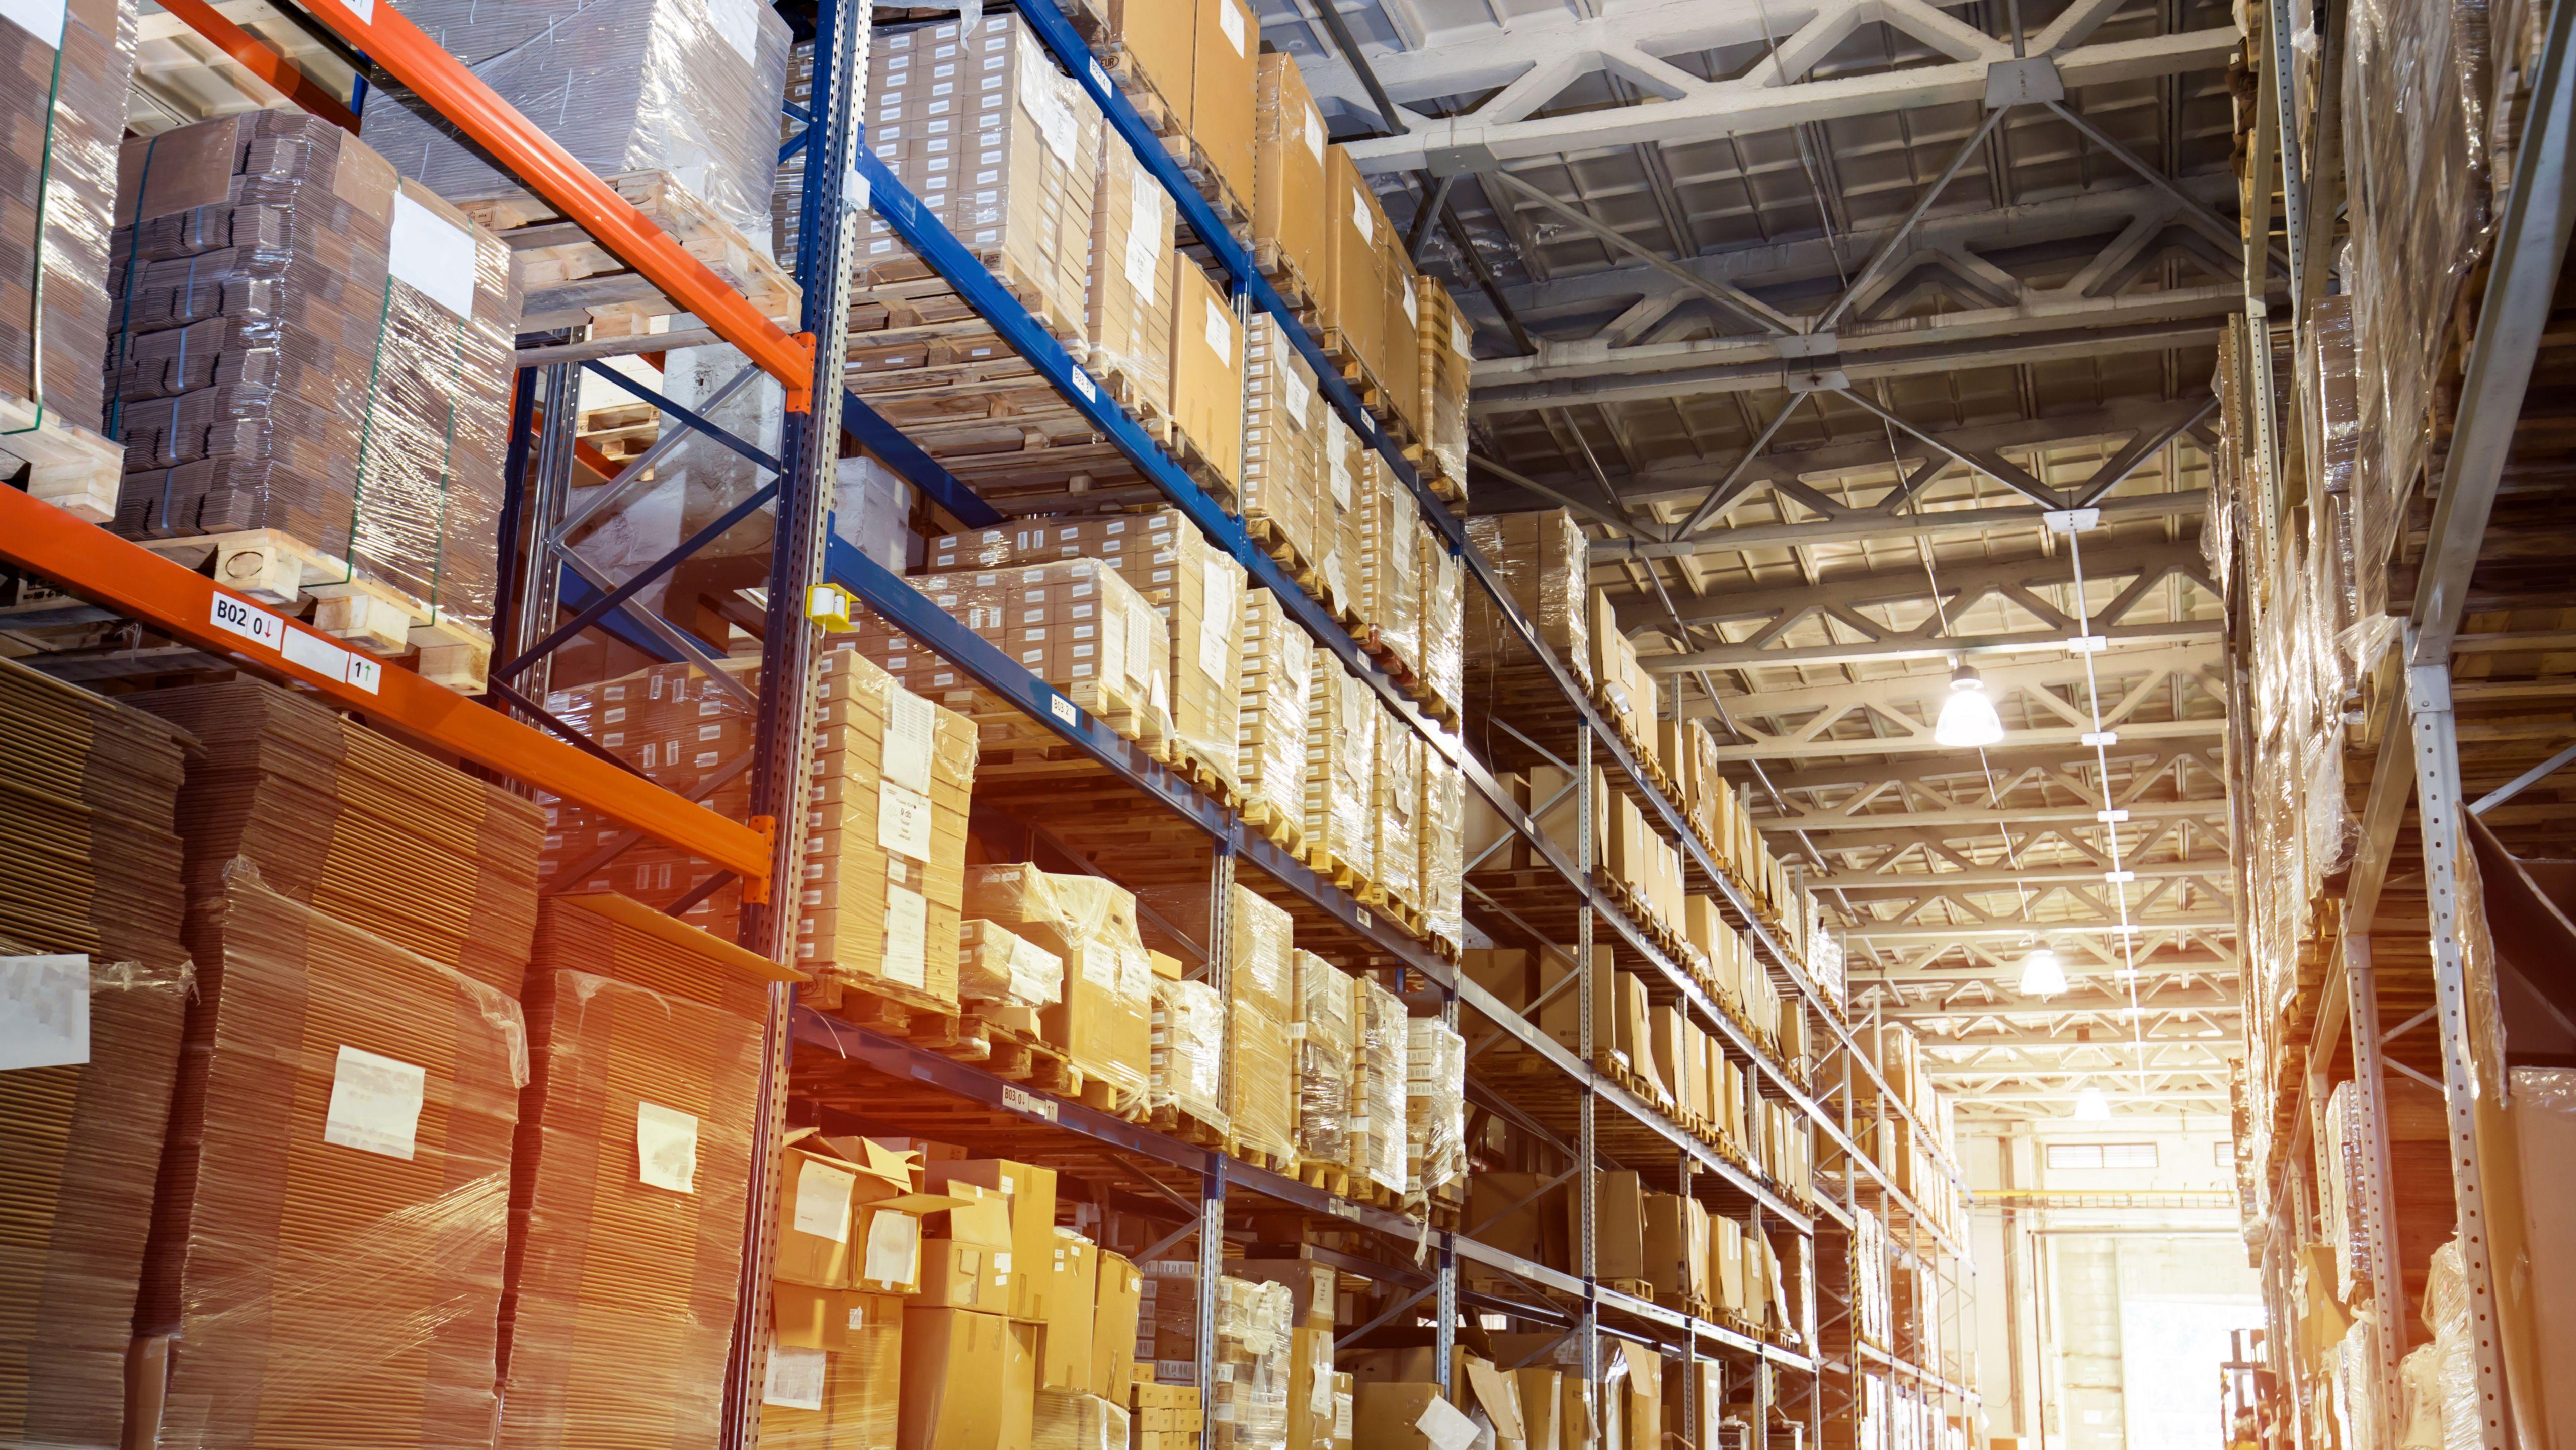 Overeenkomst inzake onderdelenmanagement